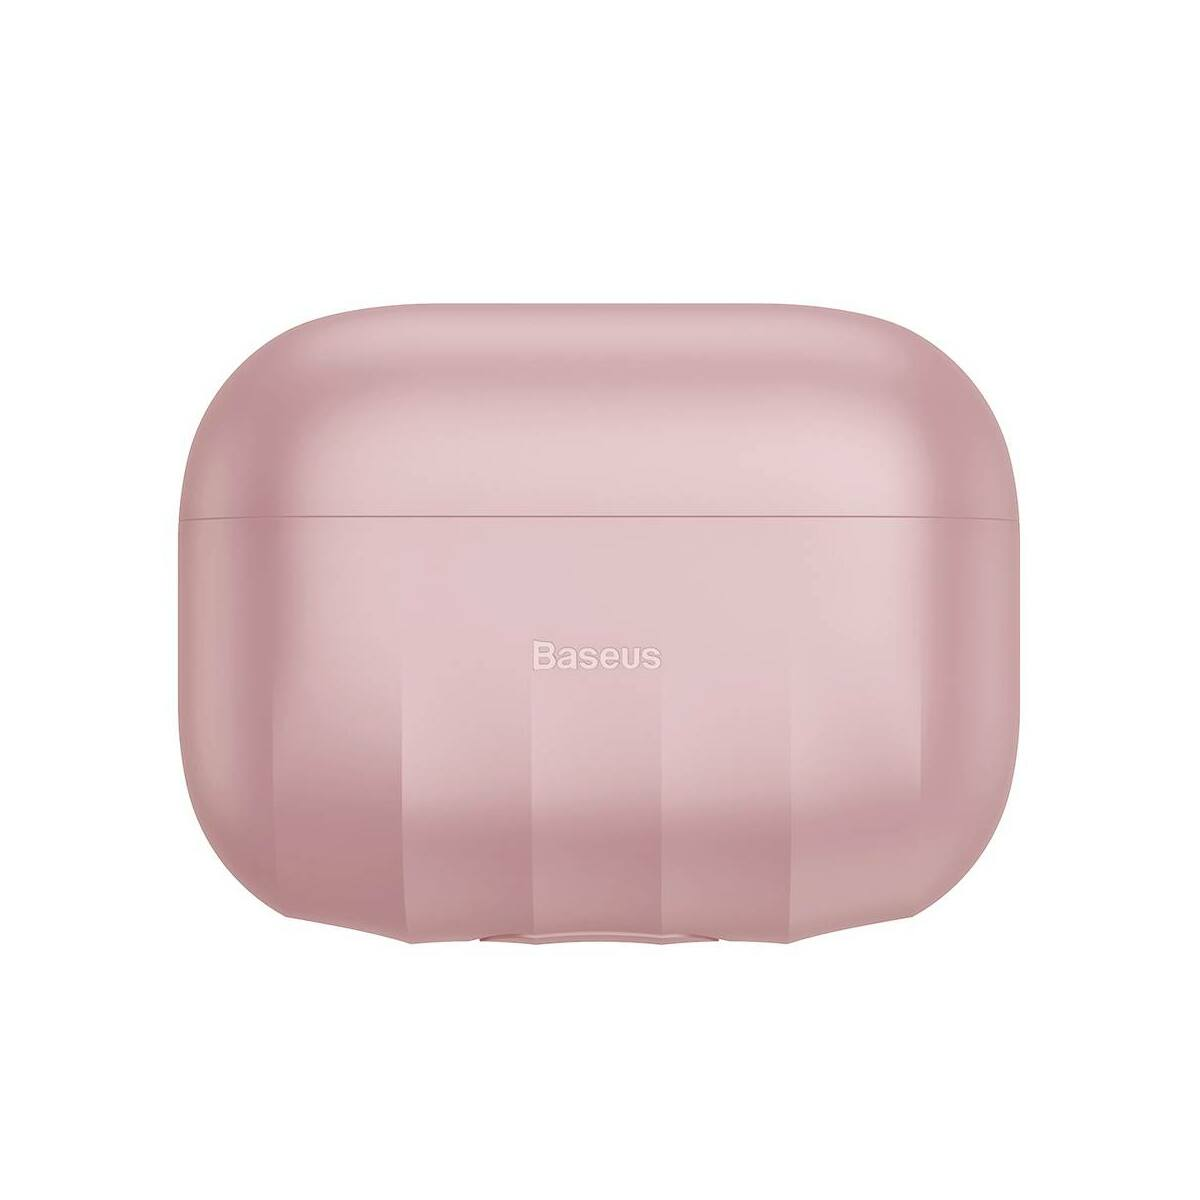 Baseus AirPods Pro tok, Shell pattern szilikon, rózsaszín (WIAPPOD-BK04)